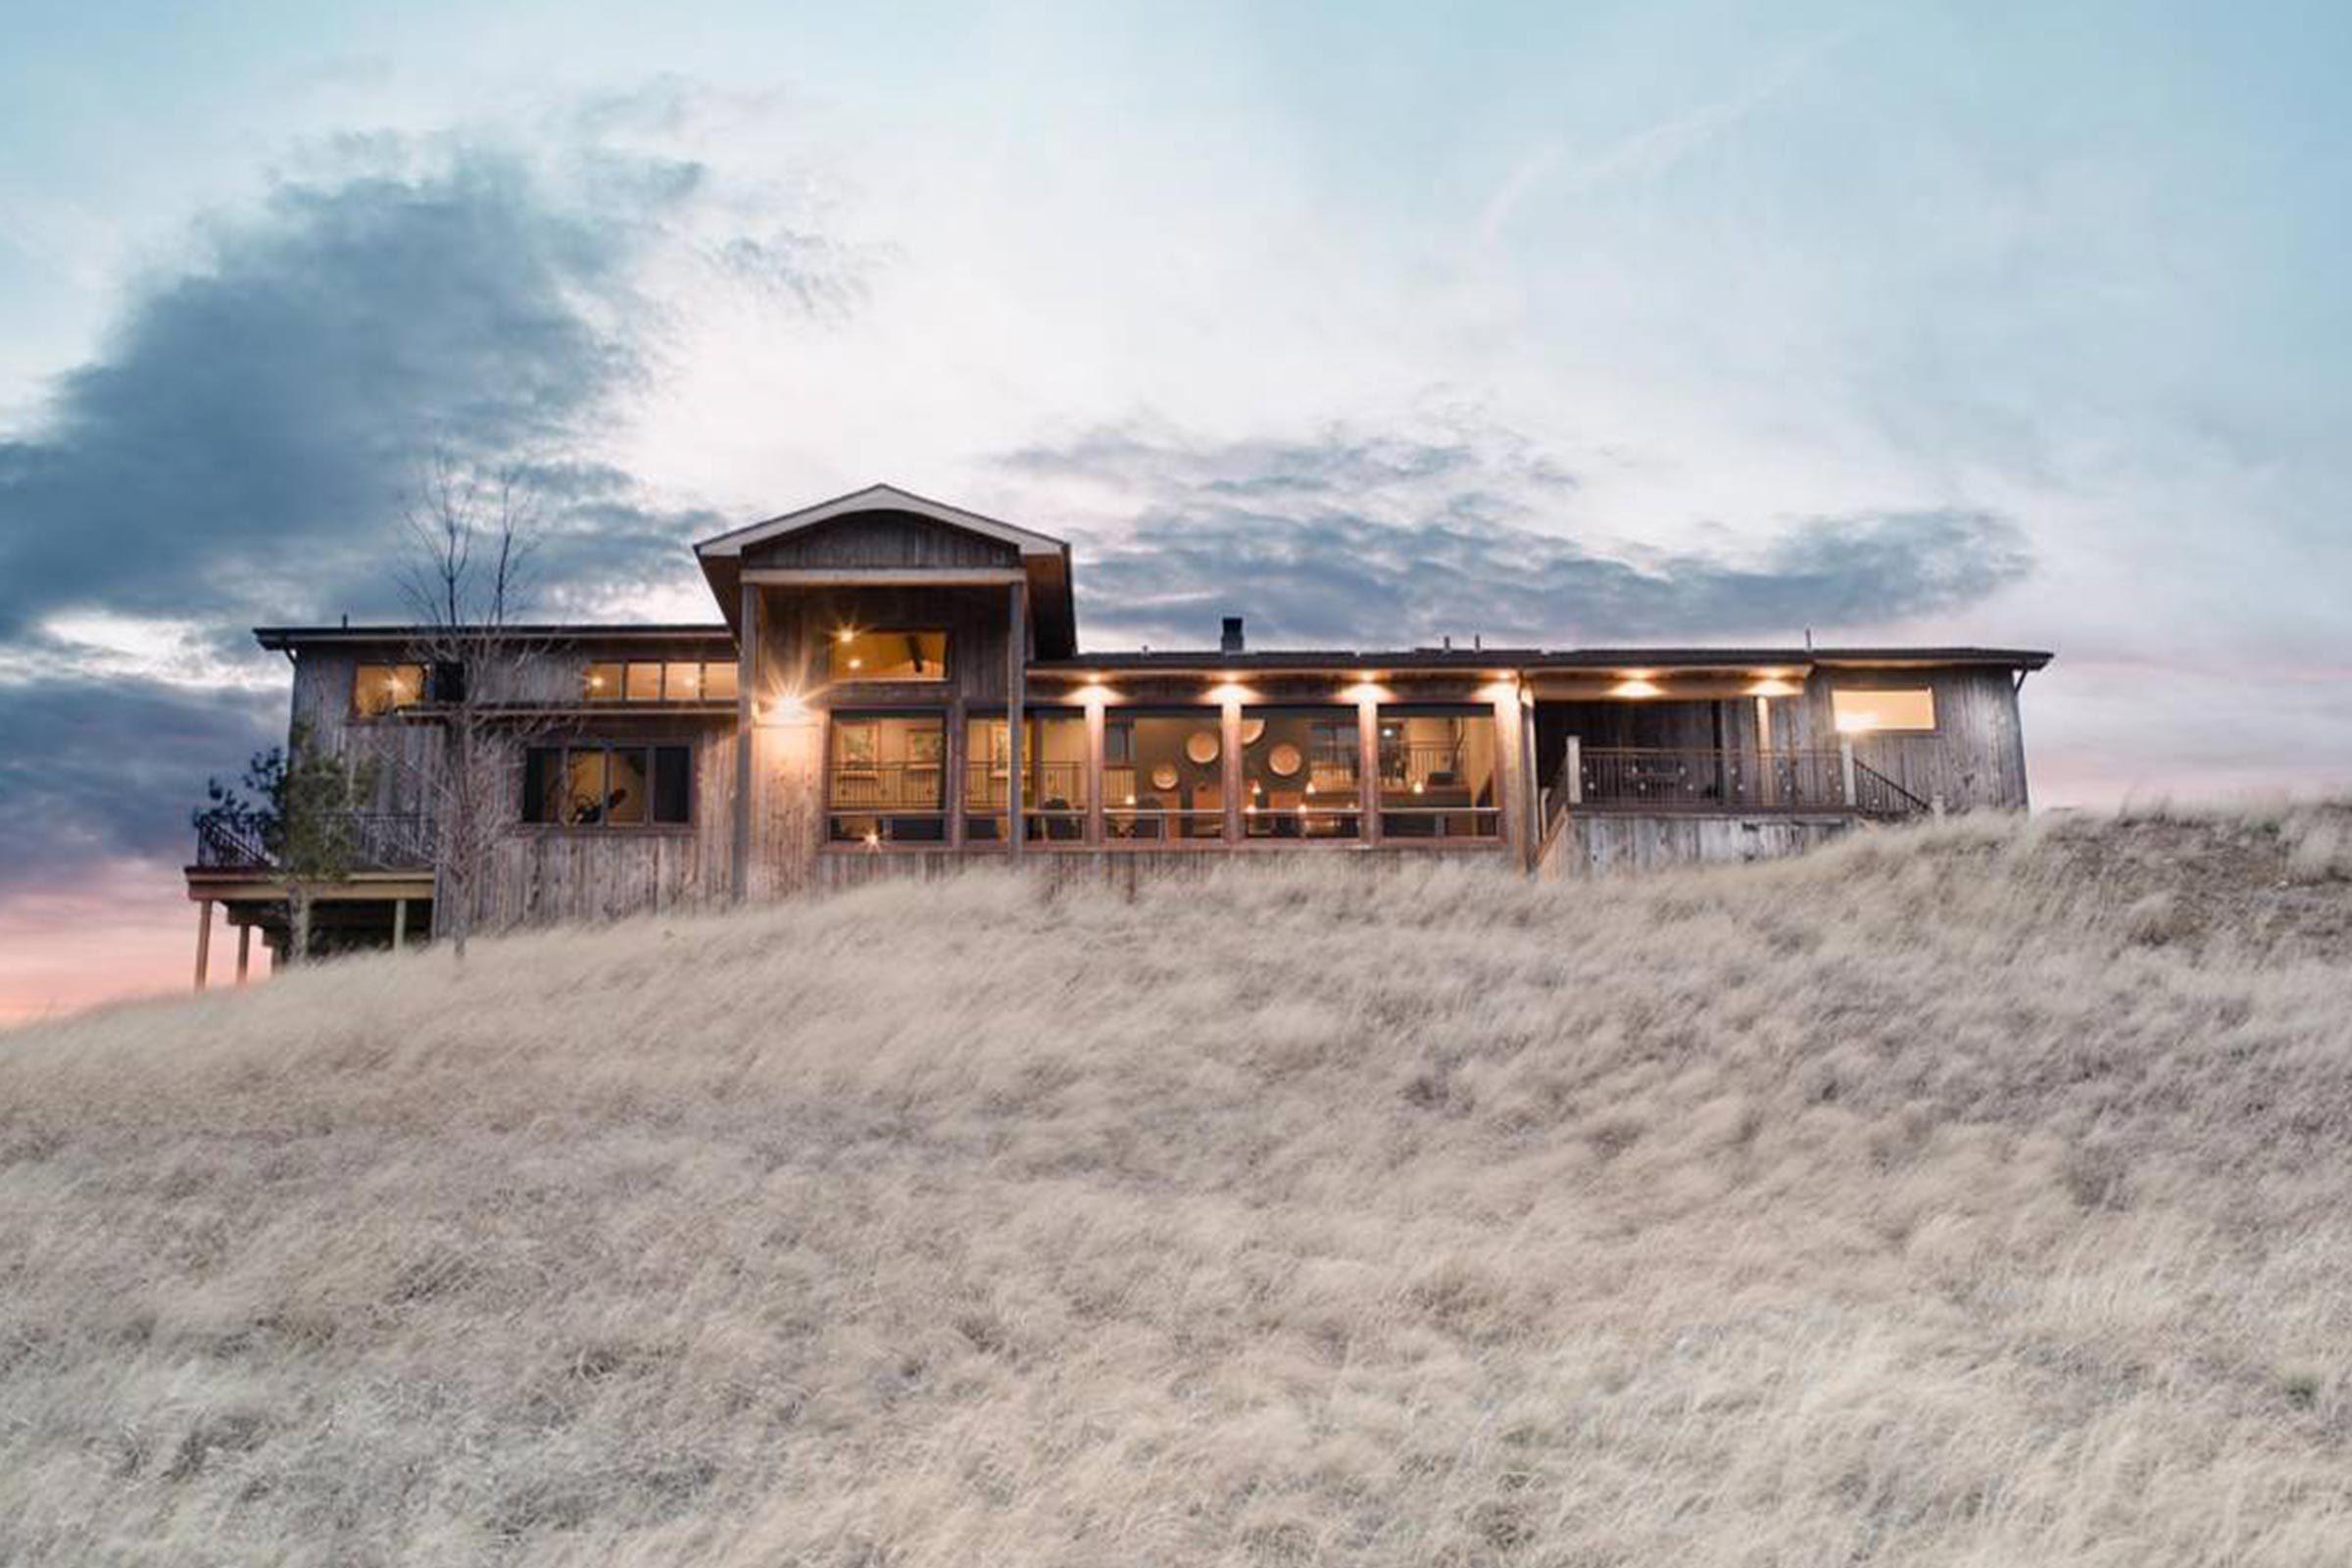 South Dakota airbnb